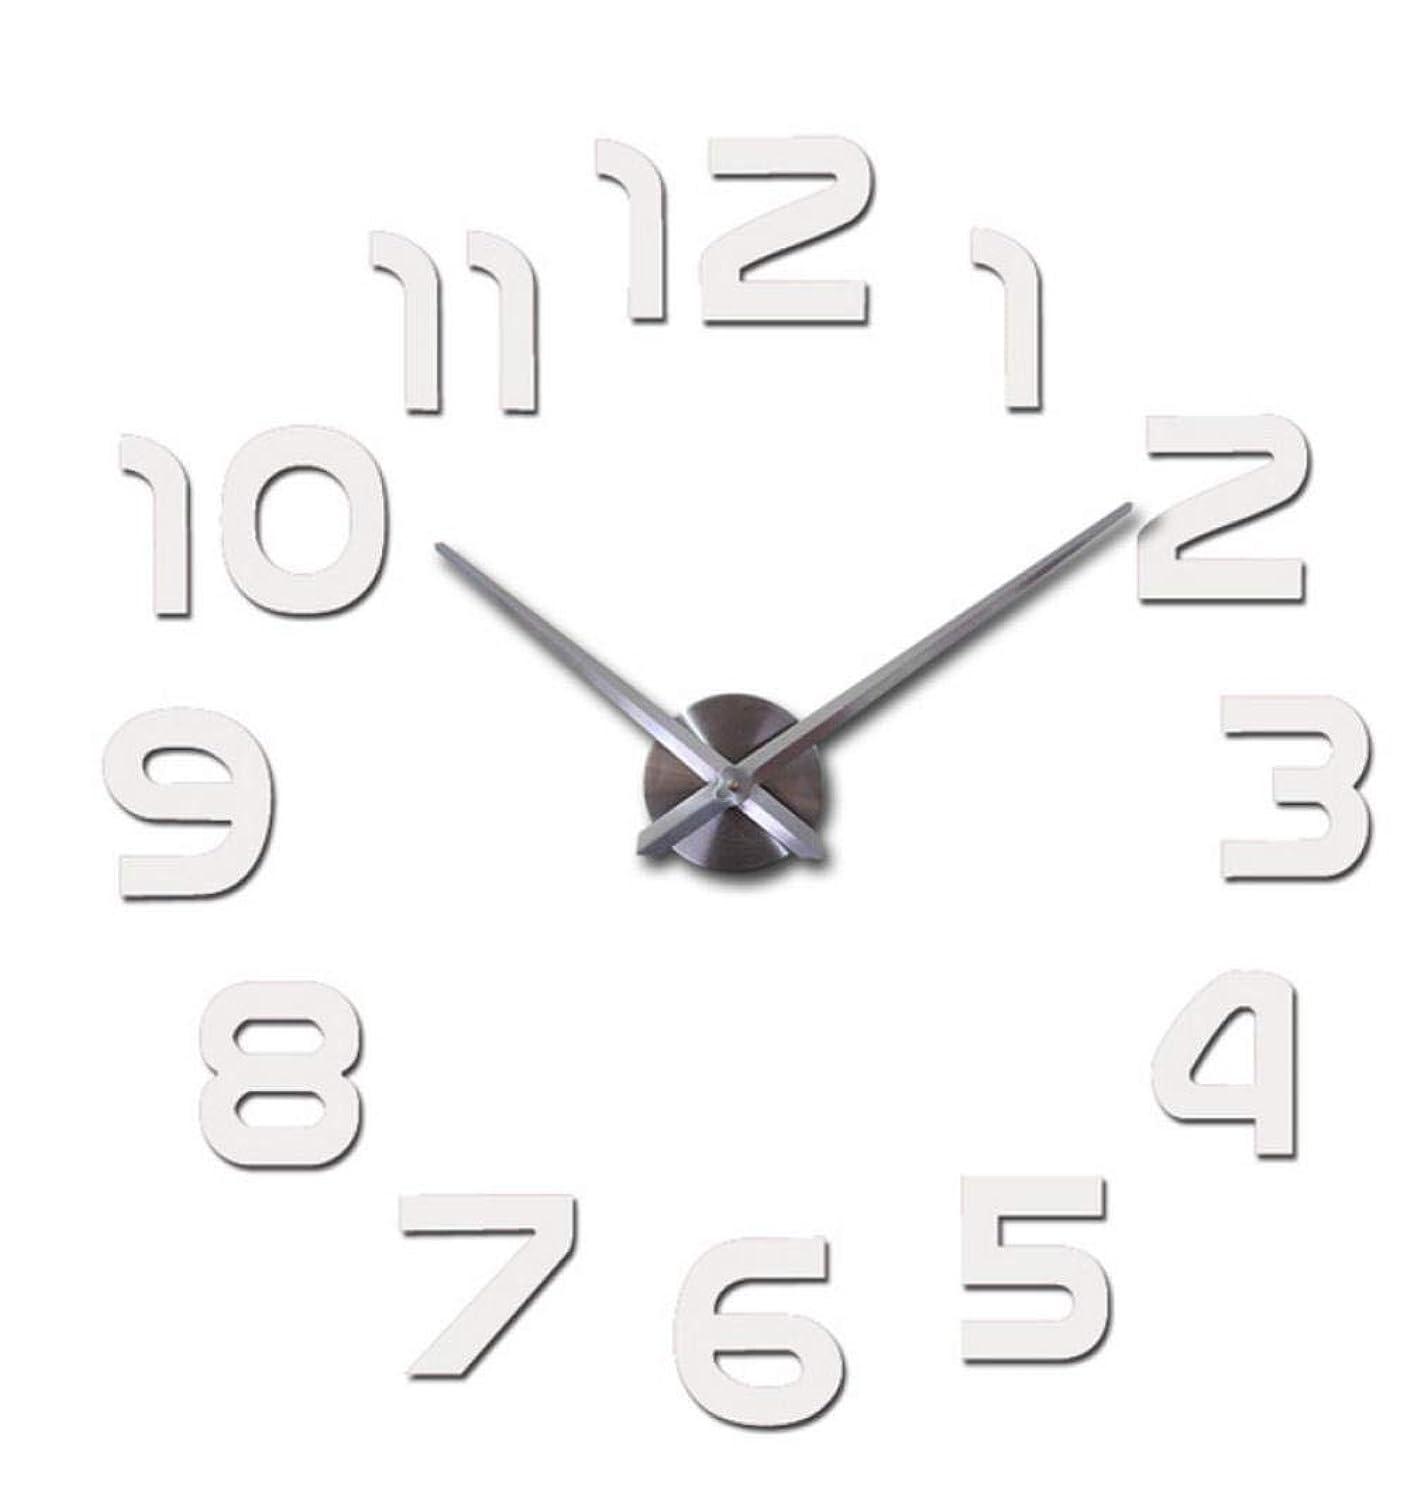 Liubaorong Mirror Wall Clocks Watches Home deocr 3D Home Decoration Wall Stickers DIY Mirror Wall clock37inch